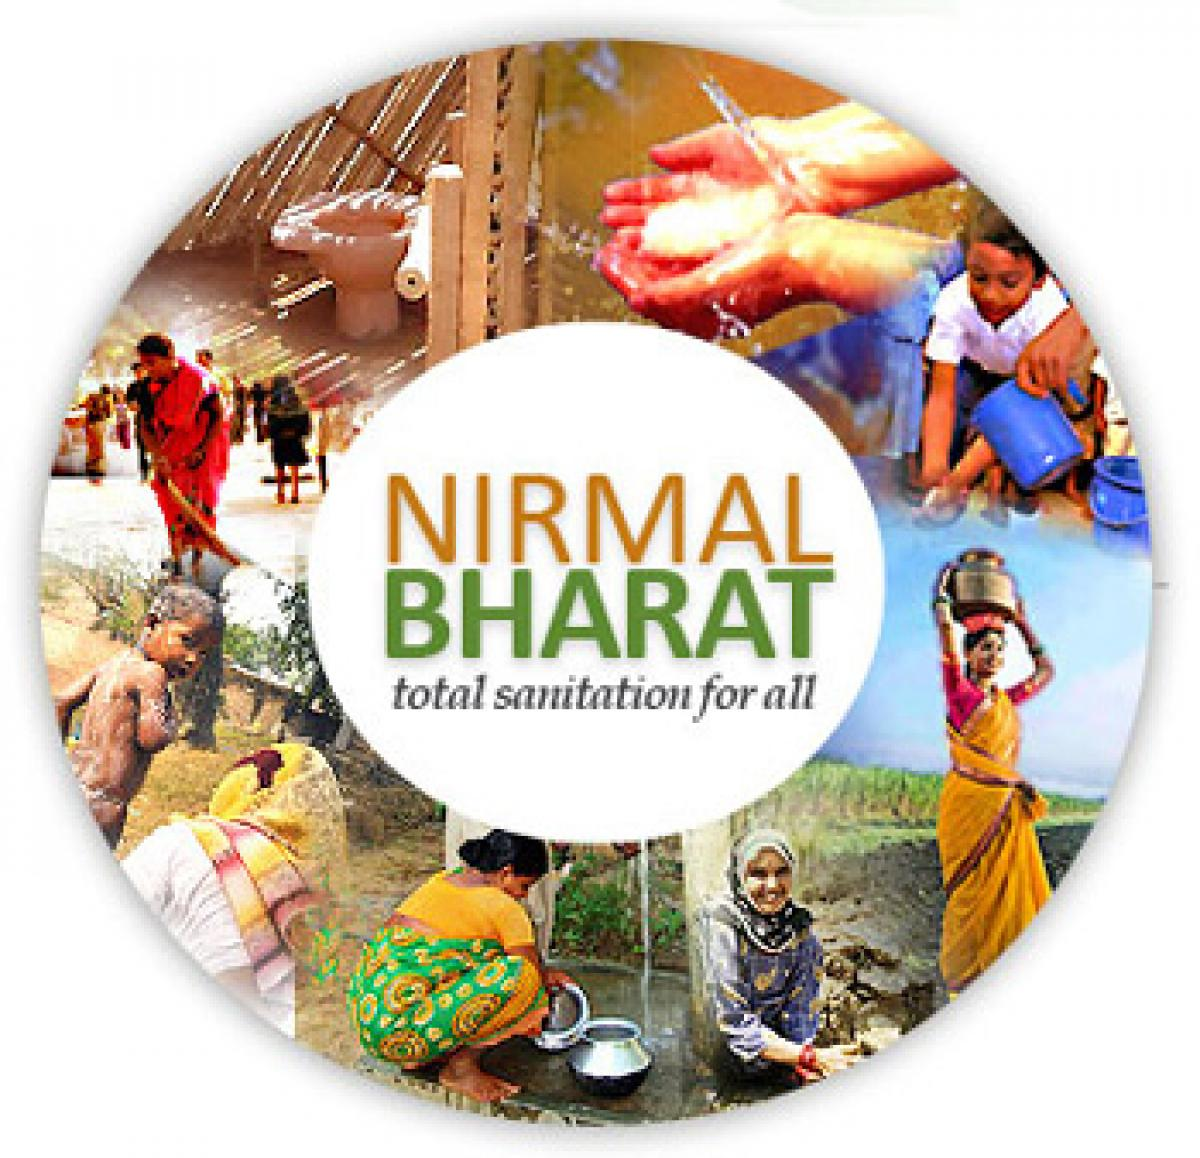 40 villages vie for Nirmal Bharat Abhiyan Award